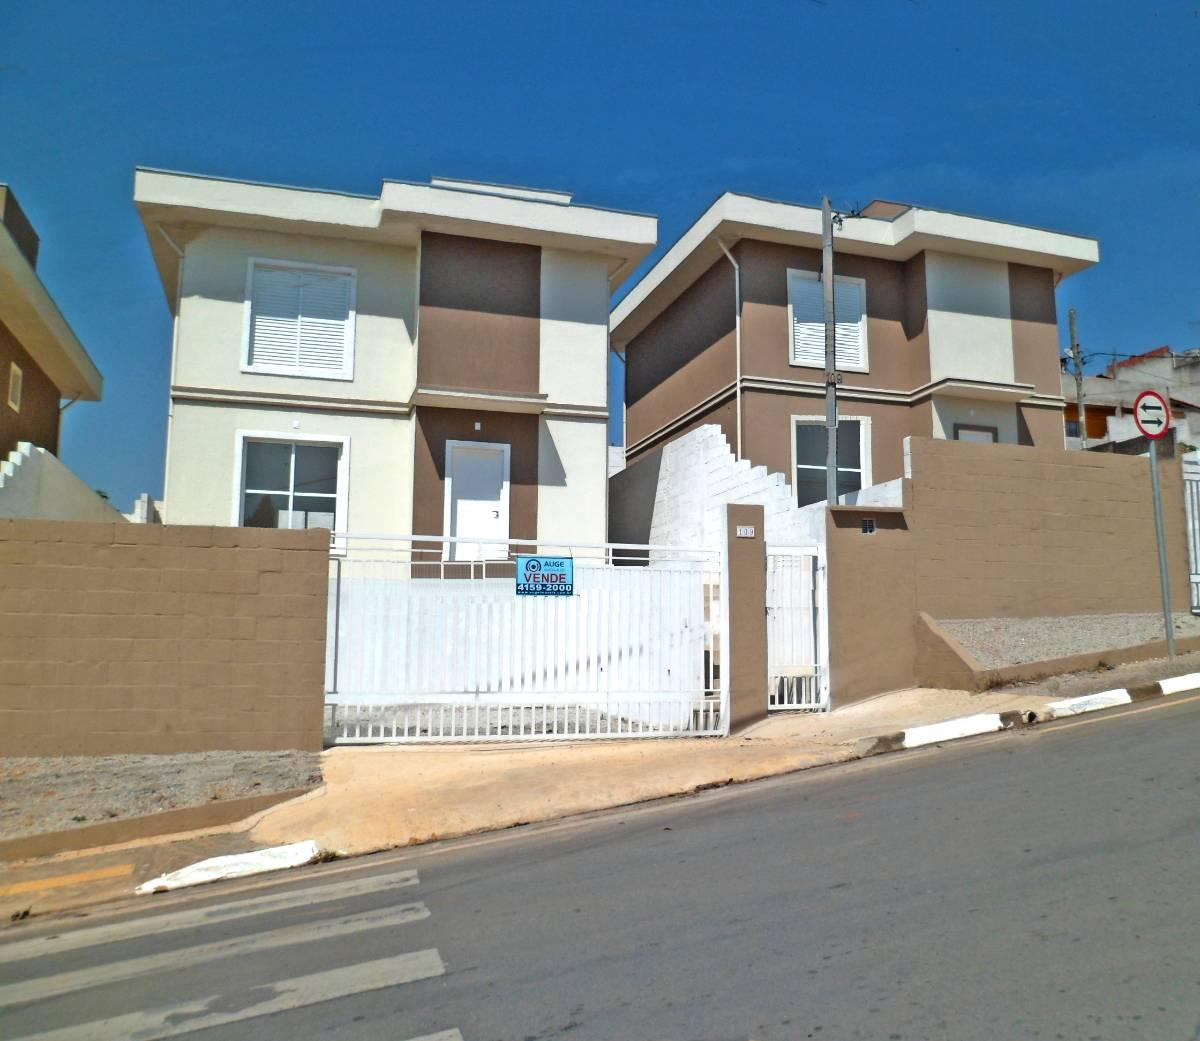 Casa á venda R$ 375.000,00 em Vargem Grande Paulista - SP